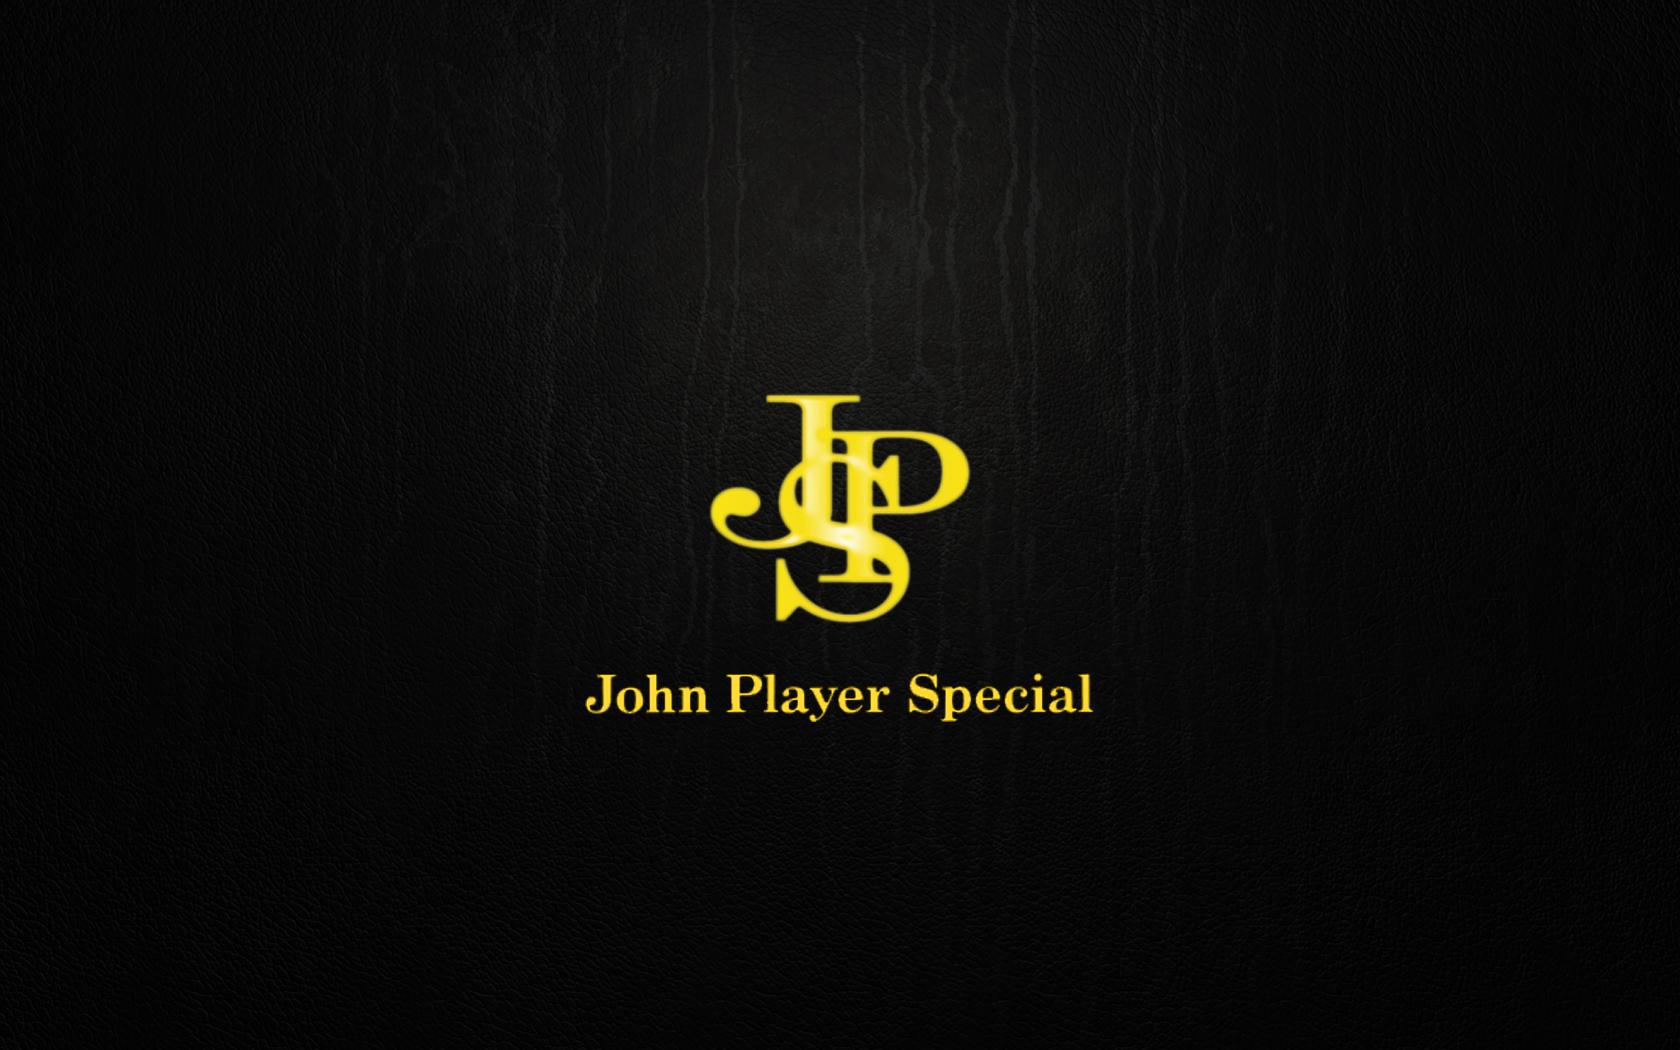 JPS75